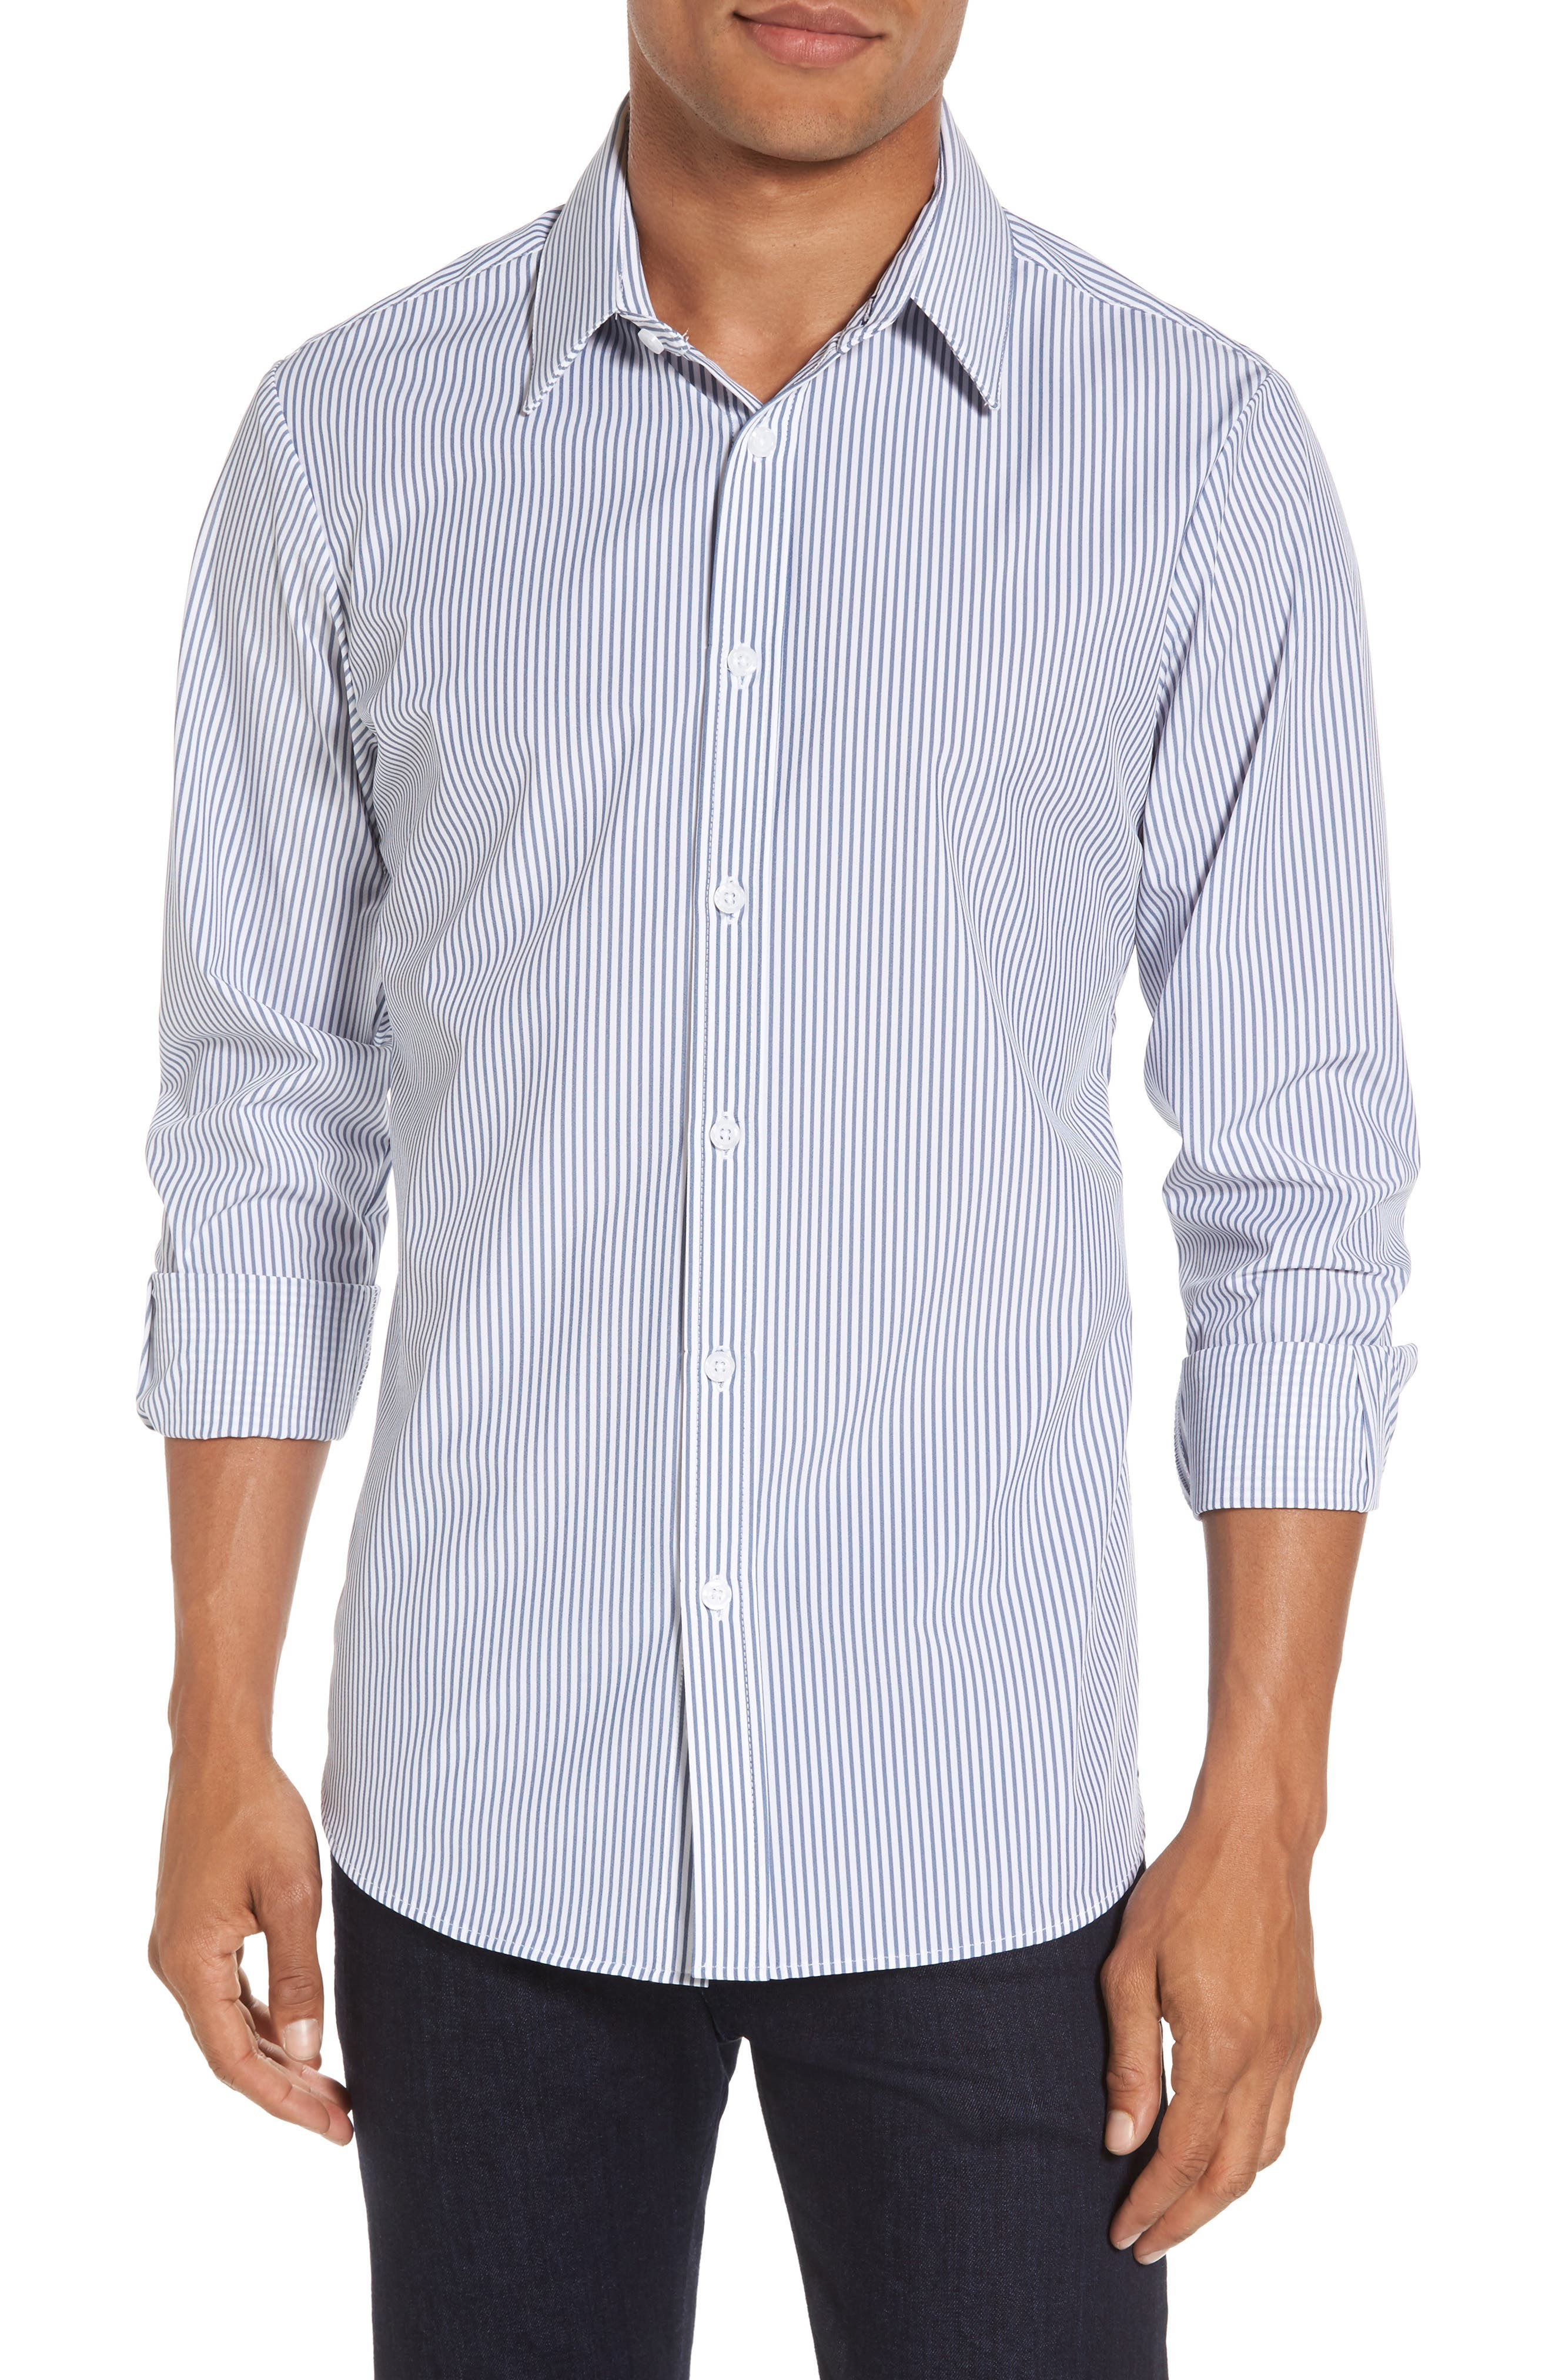 Blue Label Stockton Stripe Performance Sport Shirt,                         Main,                         color, Blue